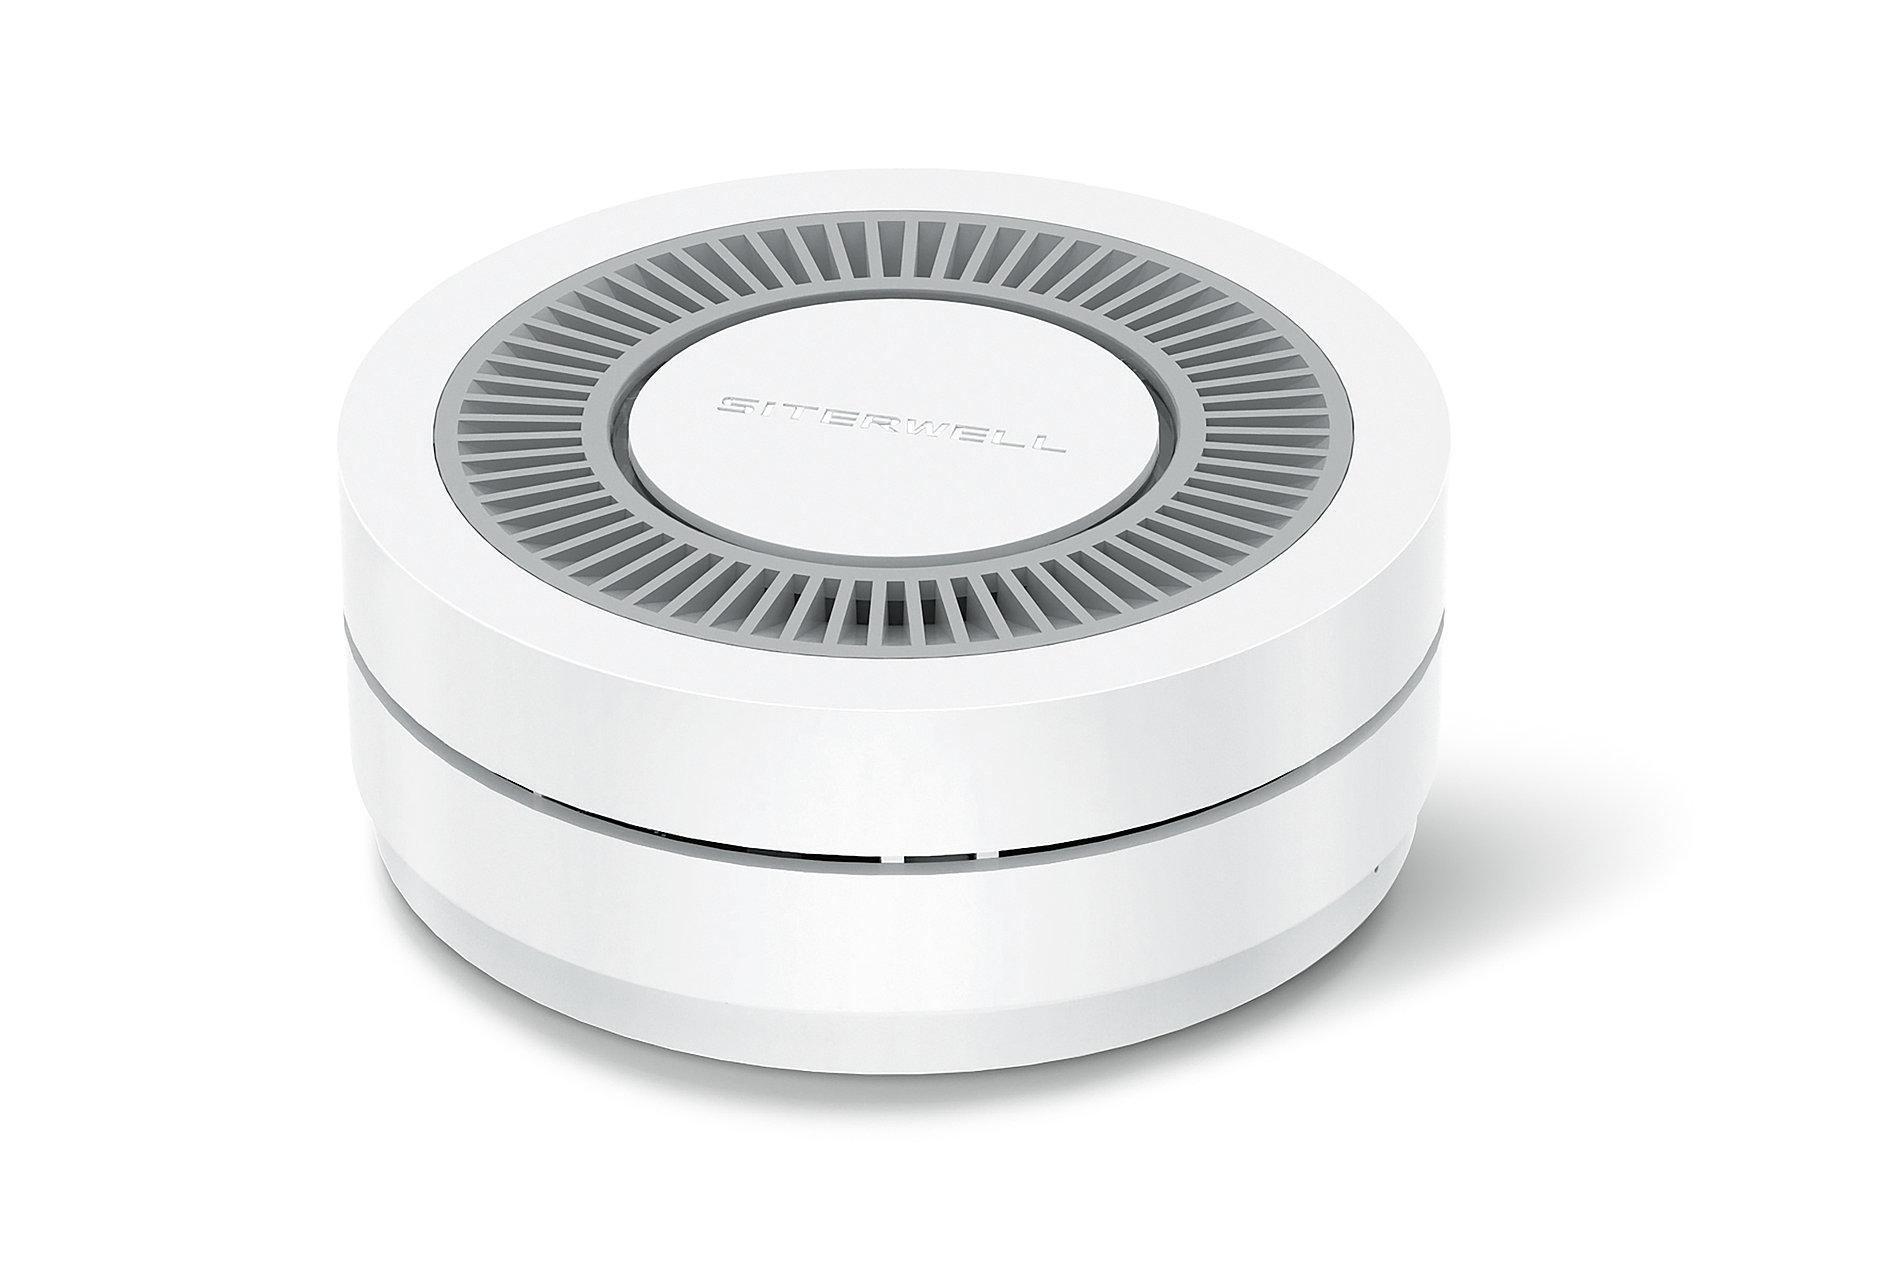 Siterwell GS524N | Red Dot Design Award